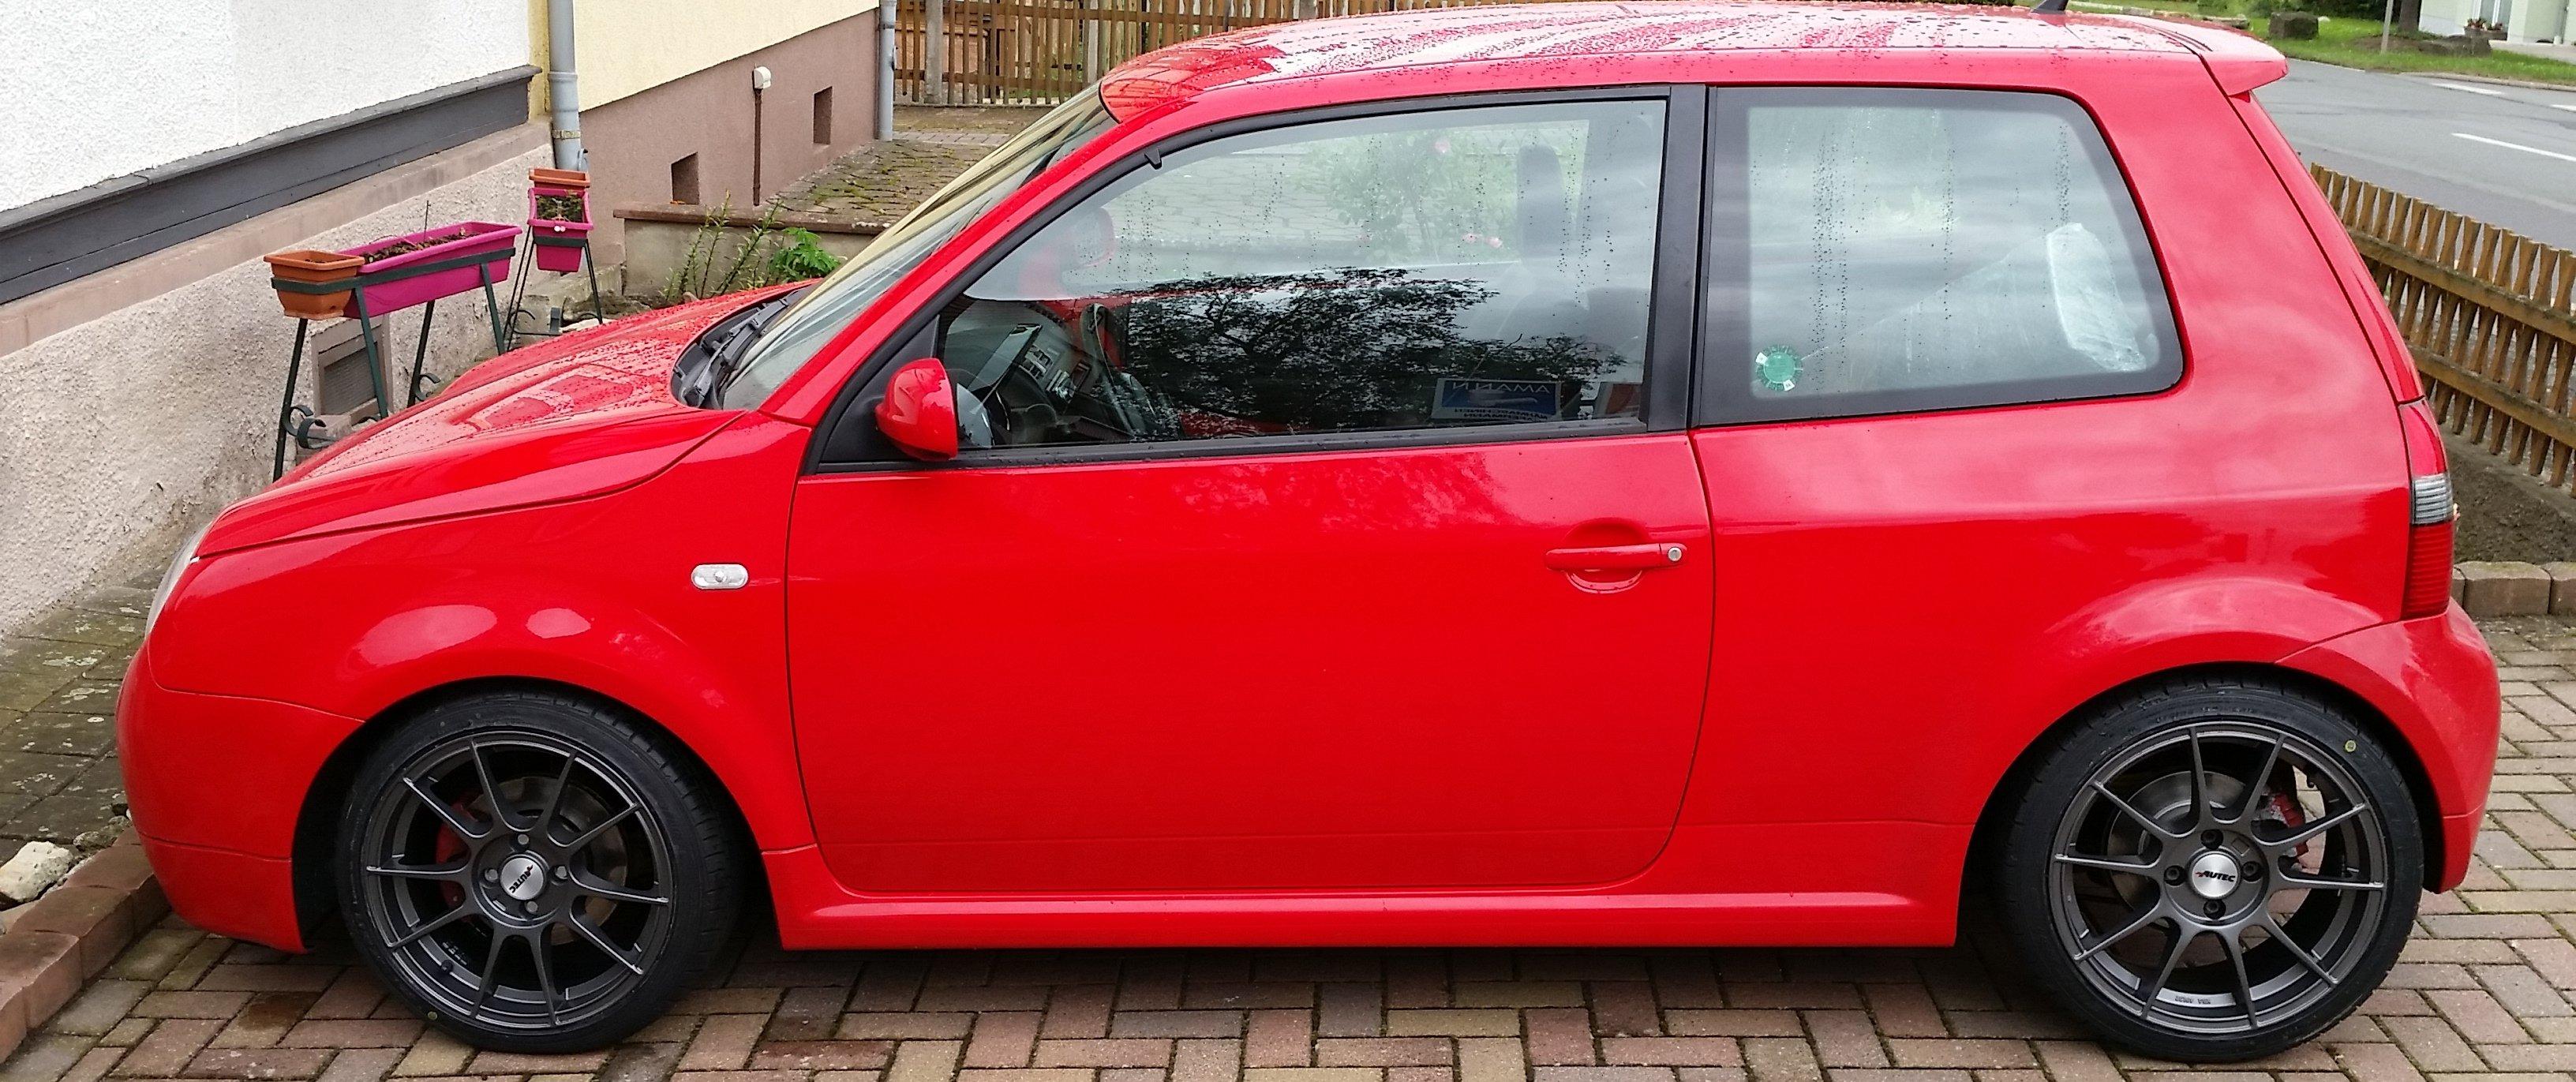 VW – Lupo – AUTEC – W – Wizard – Anthrazit – 16 Zoll